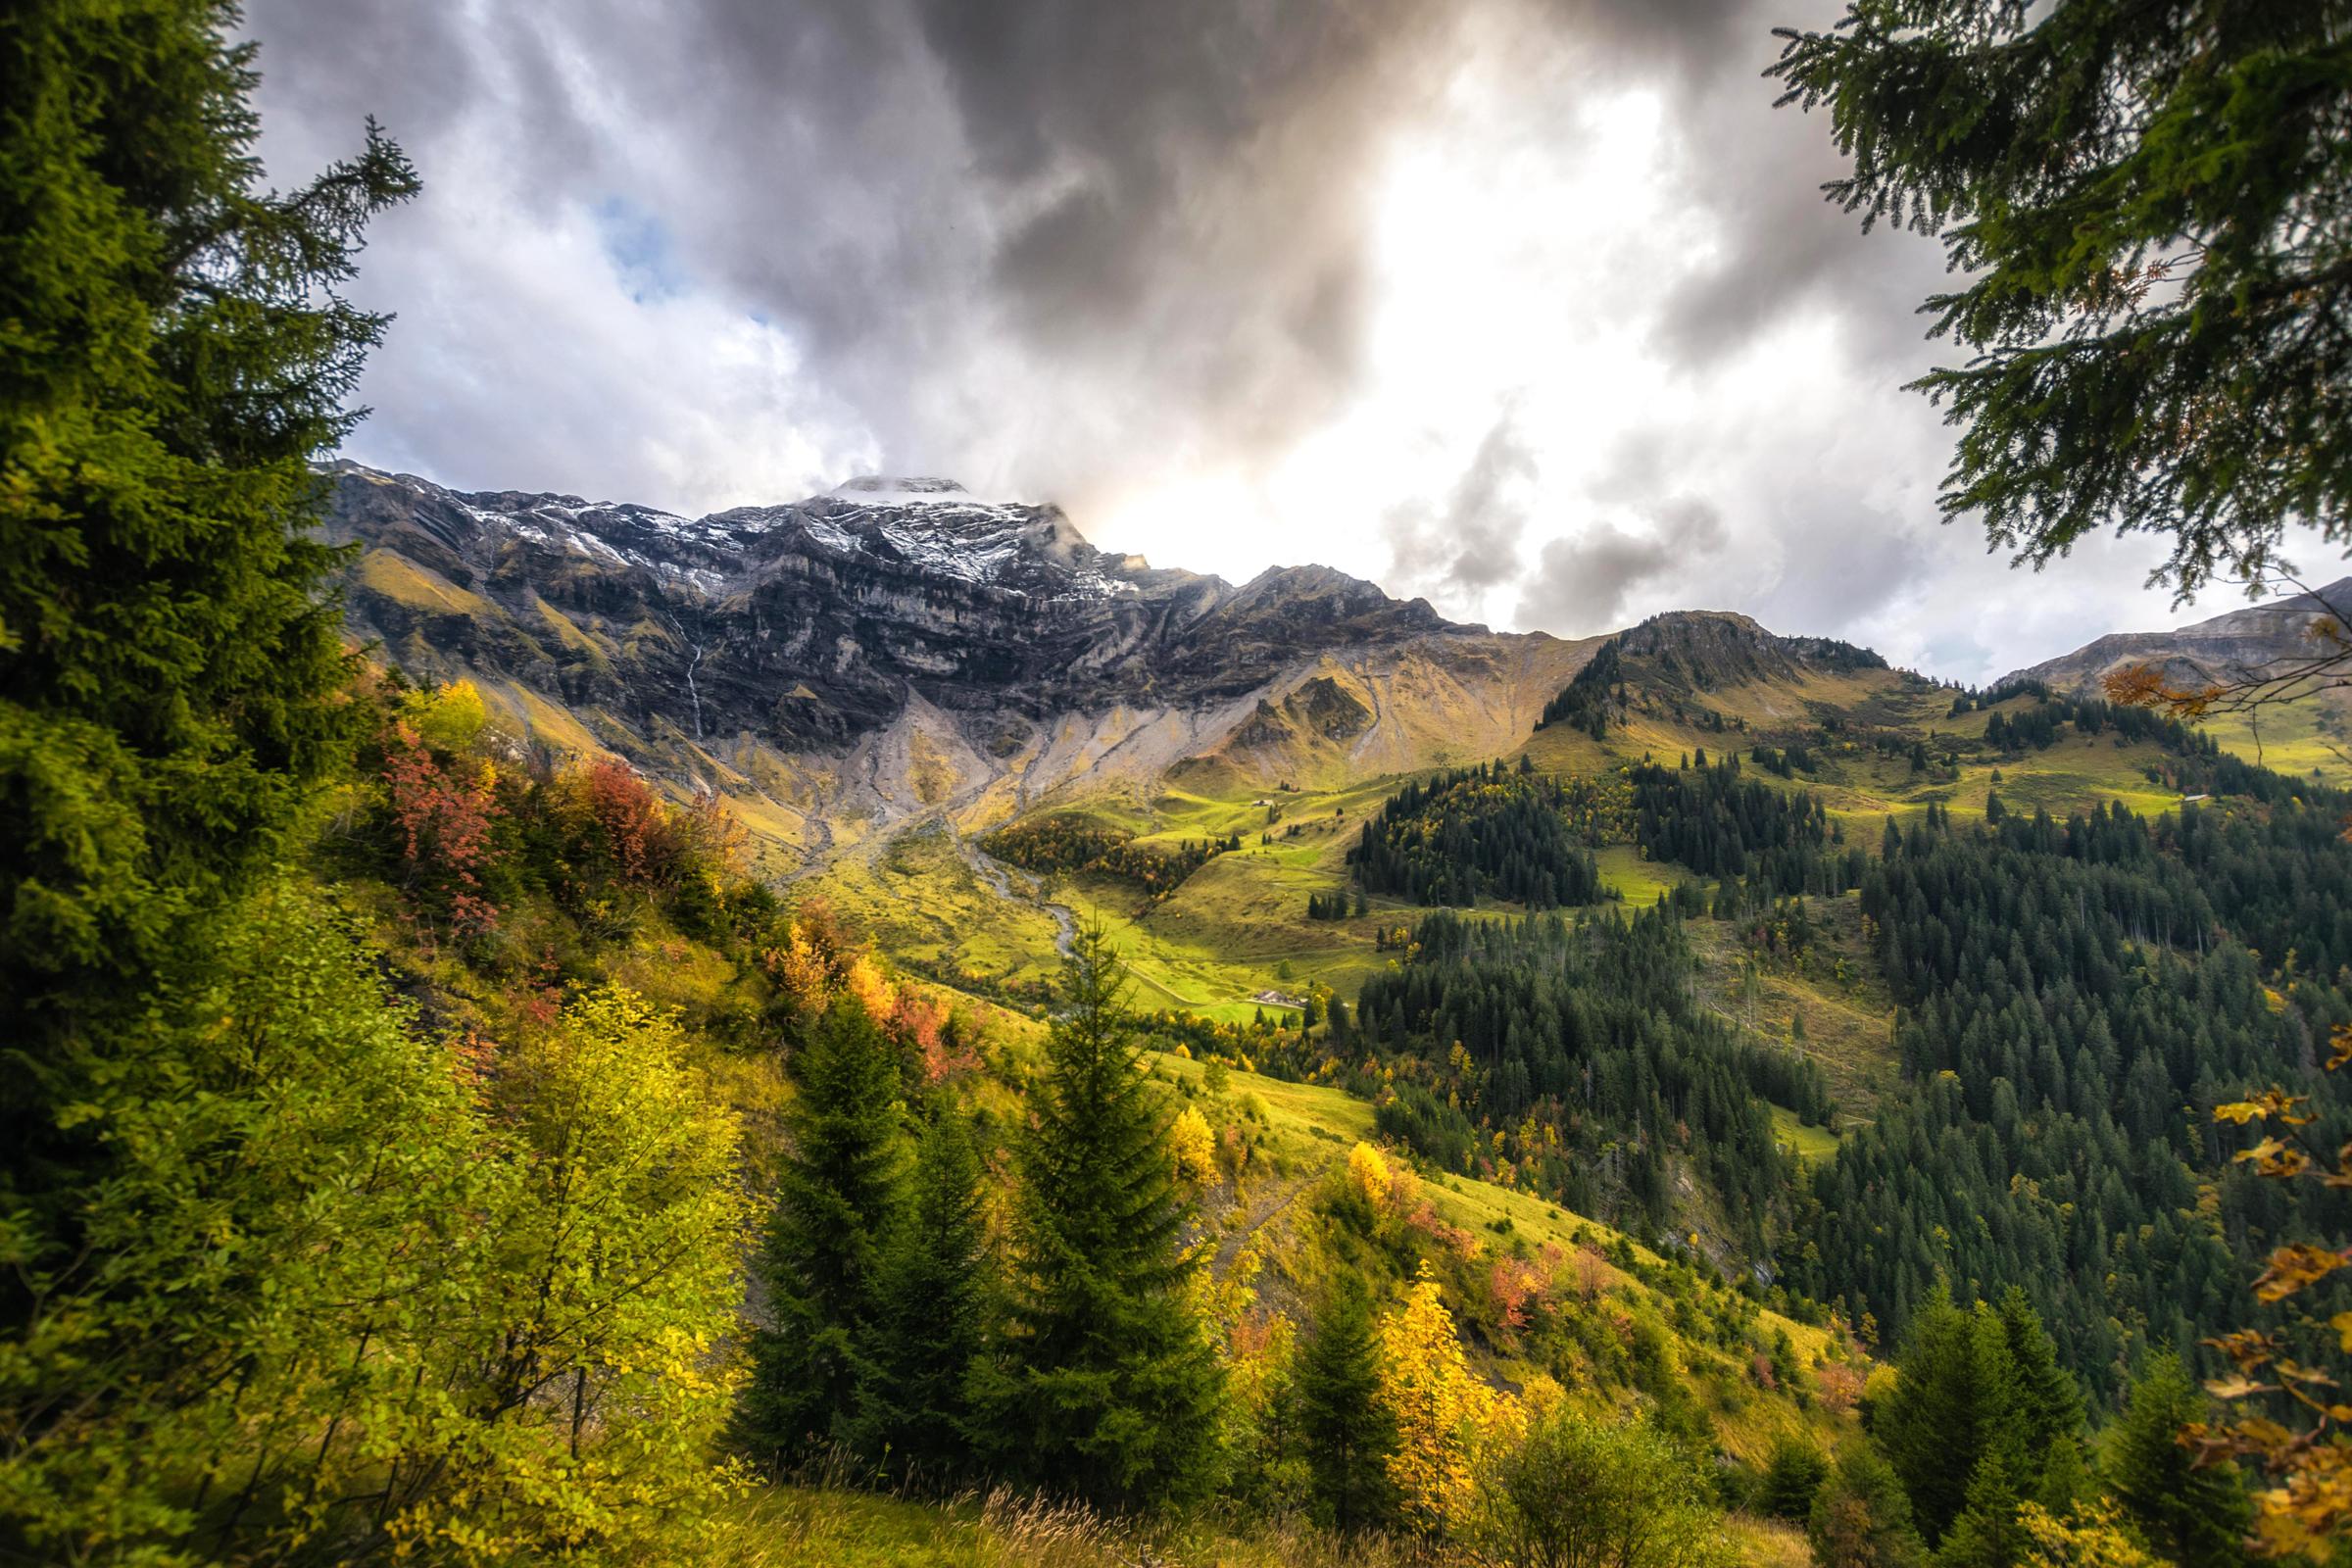 Images Switzerland Interlaken Oberhasli Nature Spruce 2400x1600 2400x1600